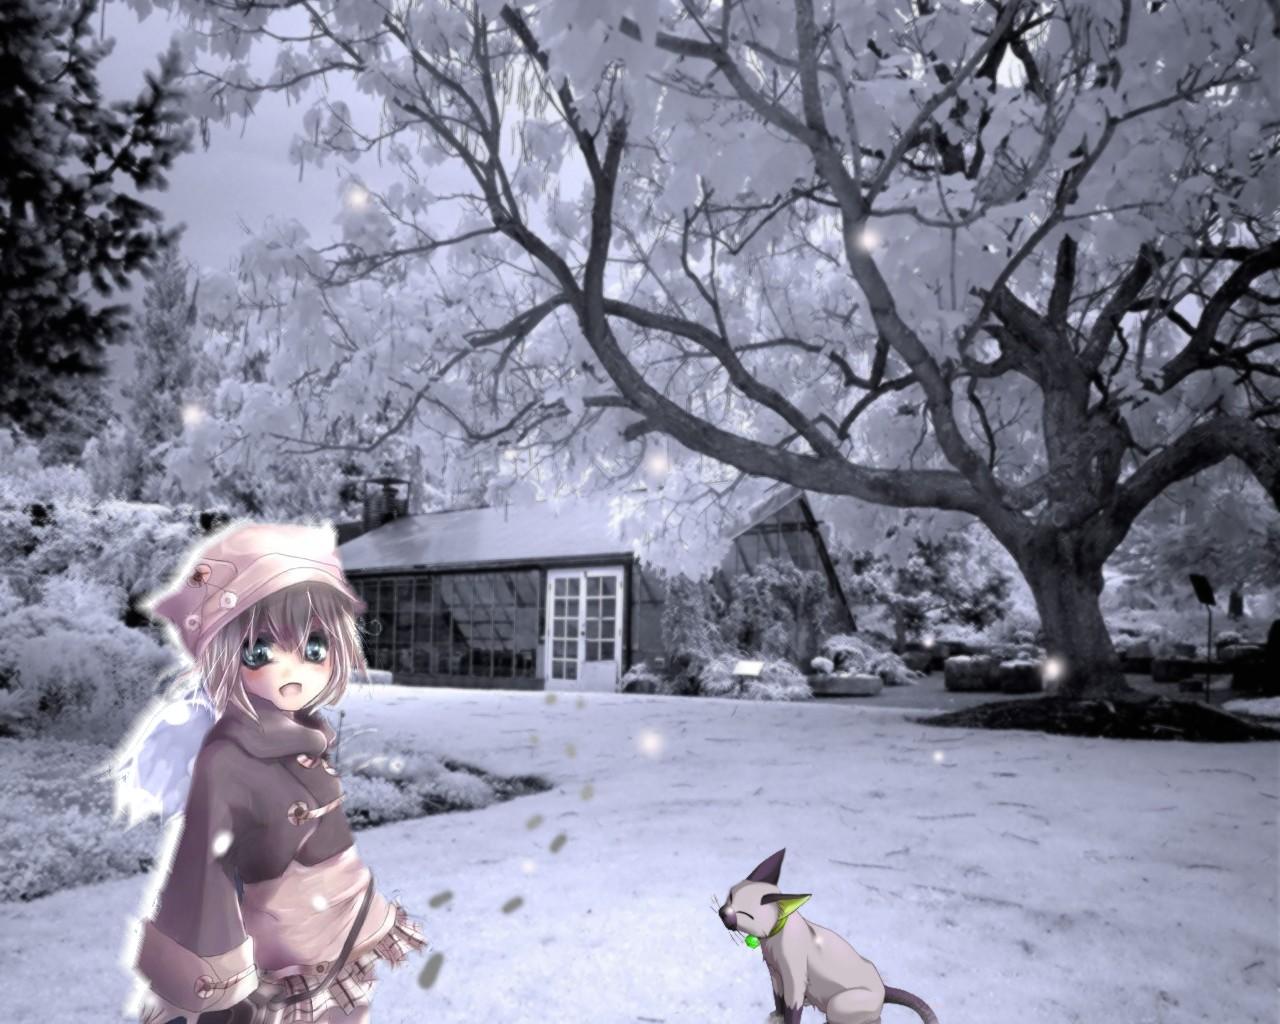 animal blonde_hair building cat green_eyes hat short_hair skirt snow tree winter